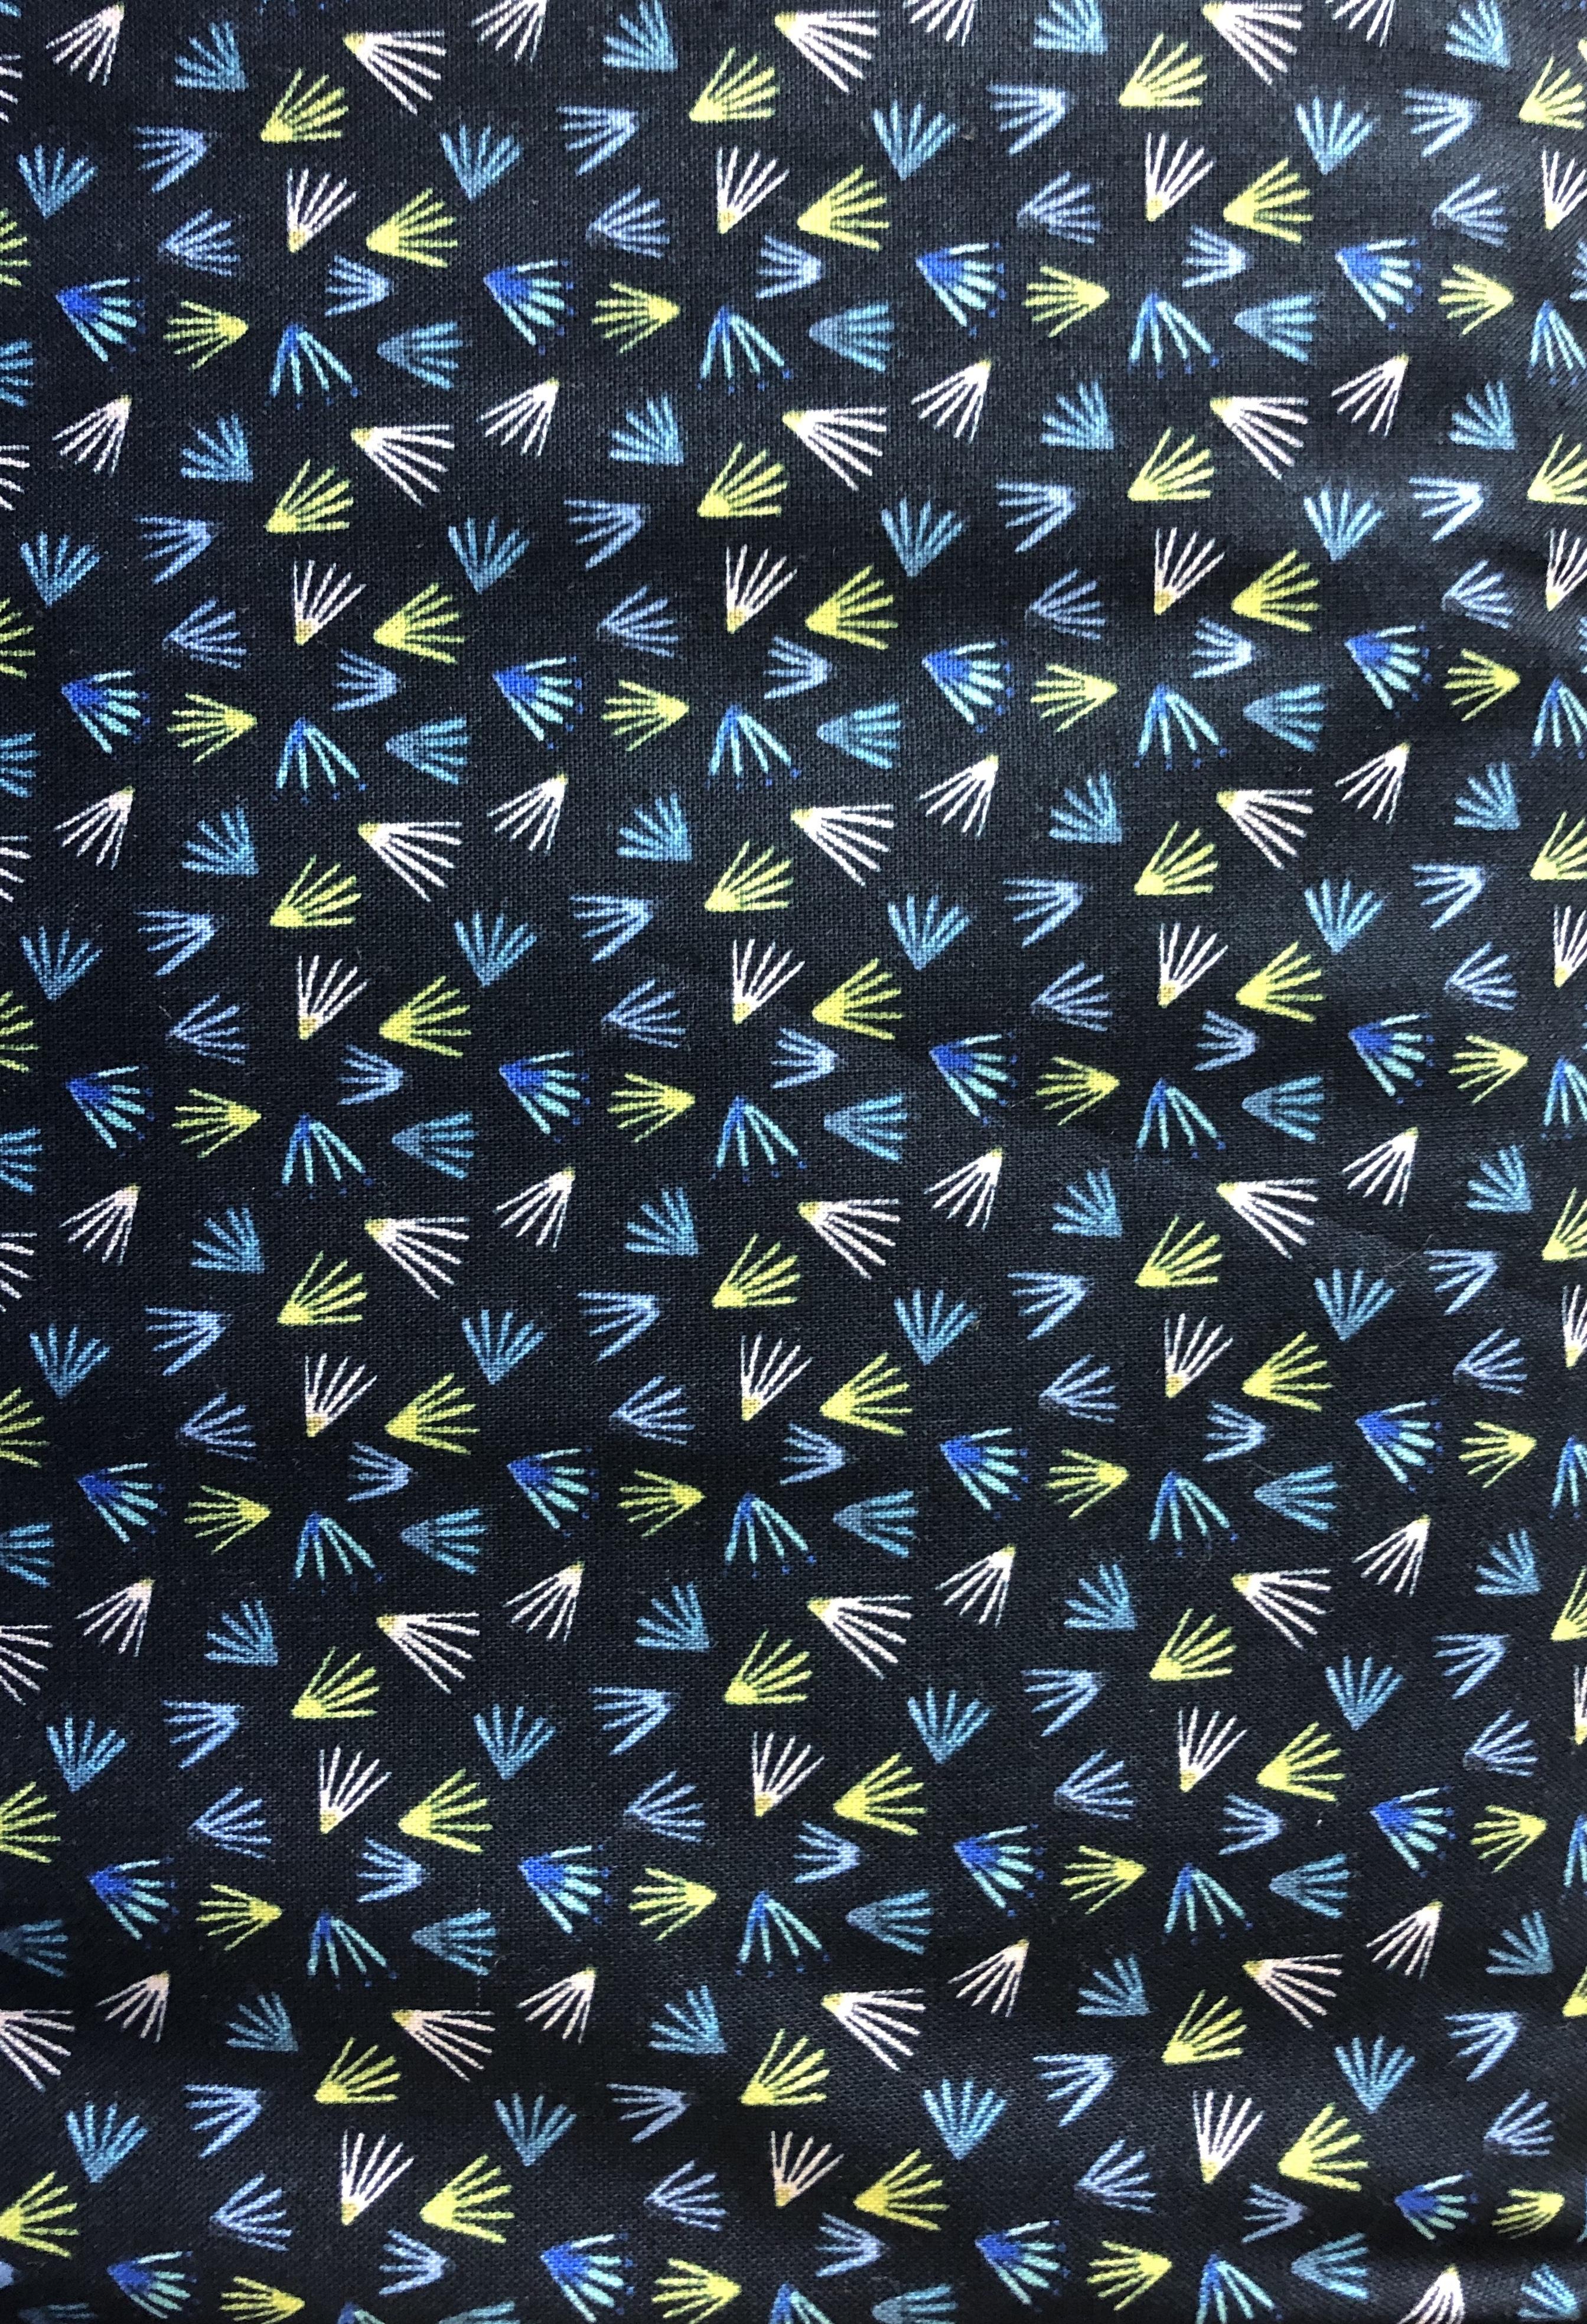 Field Day - Windham Fabrics - 1/2m cut 56368